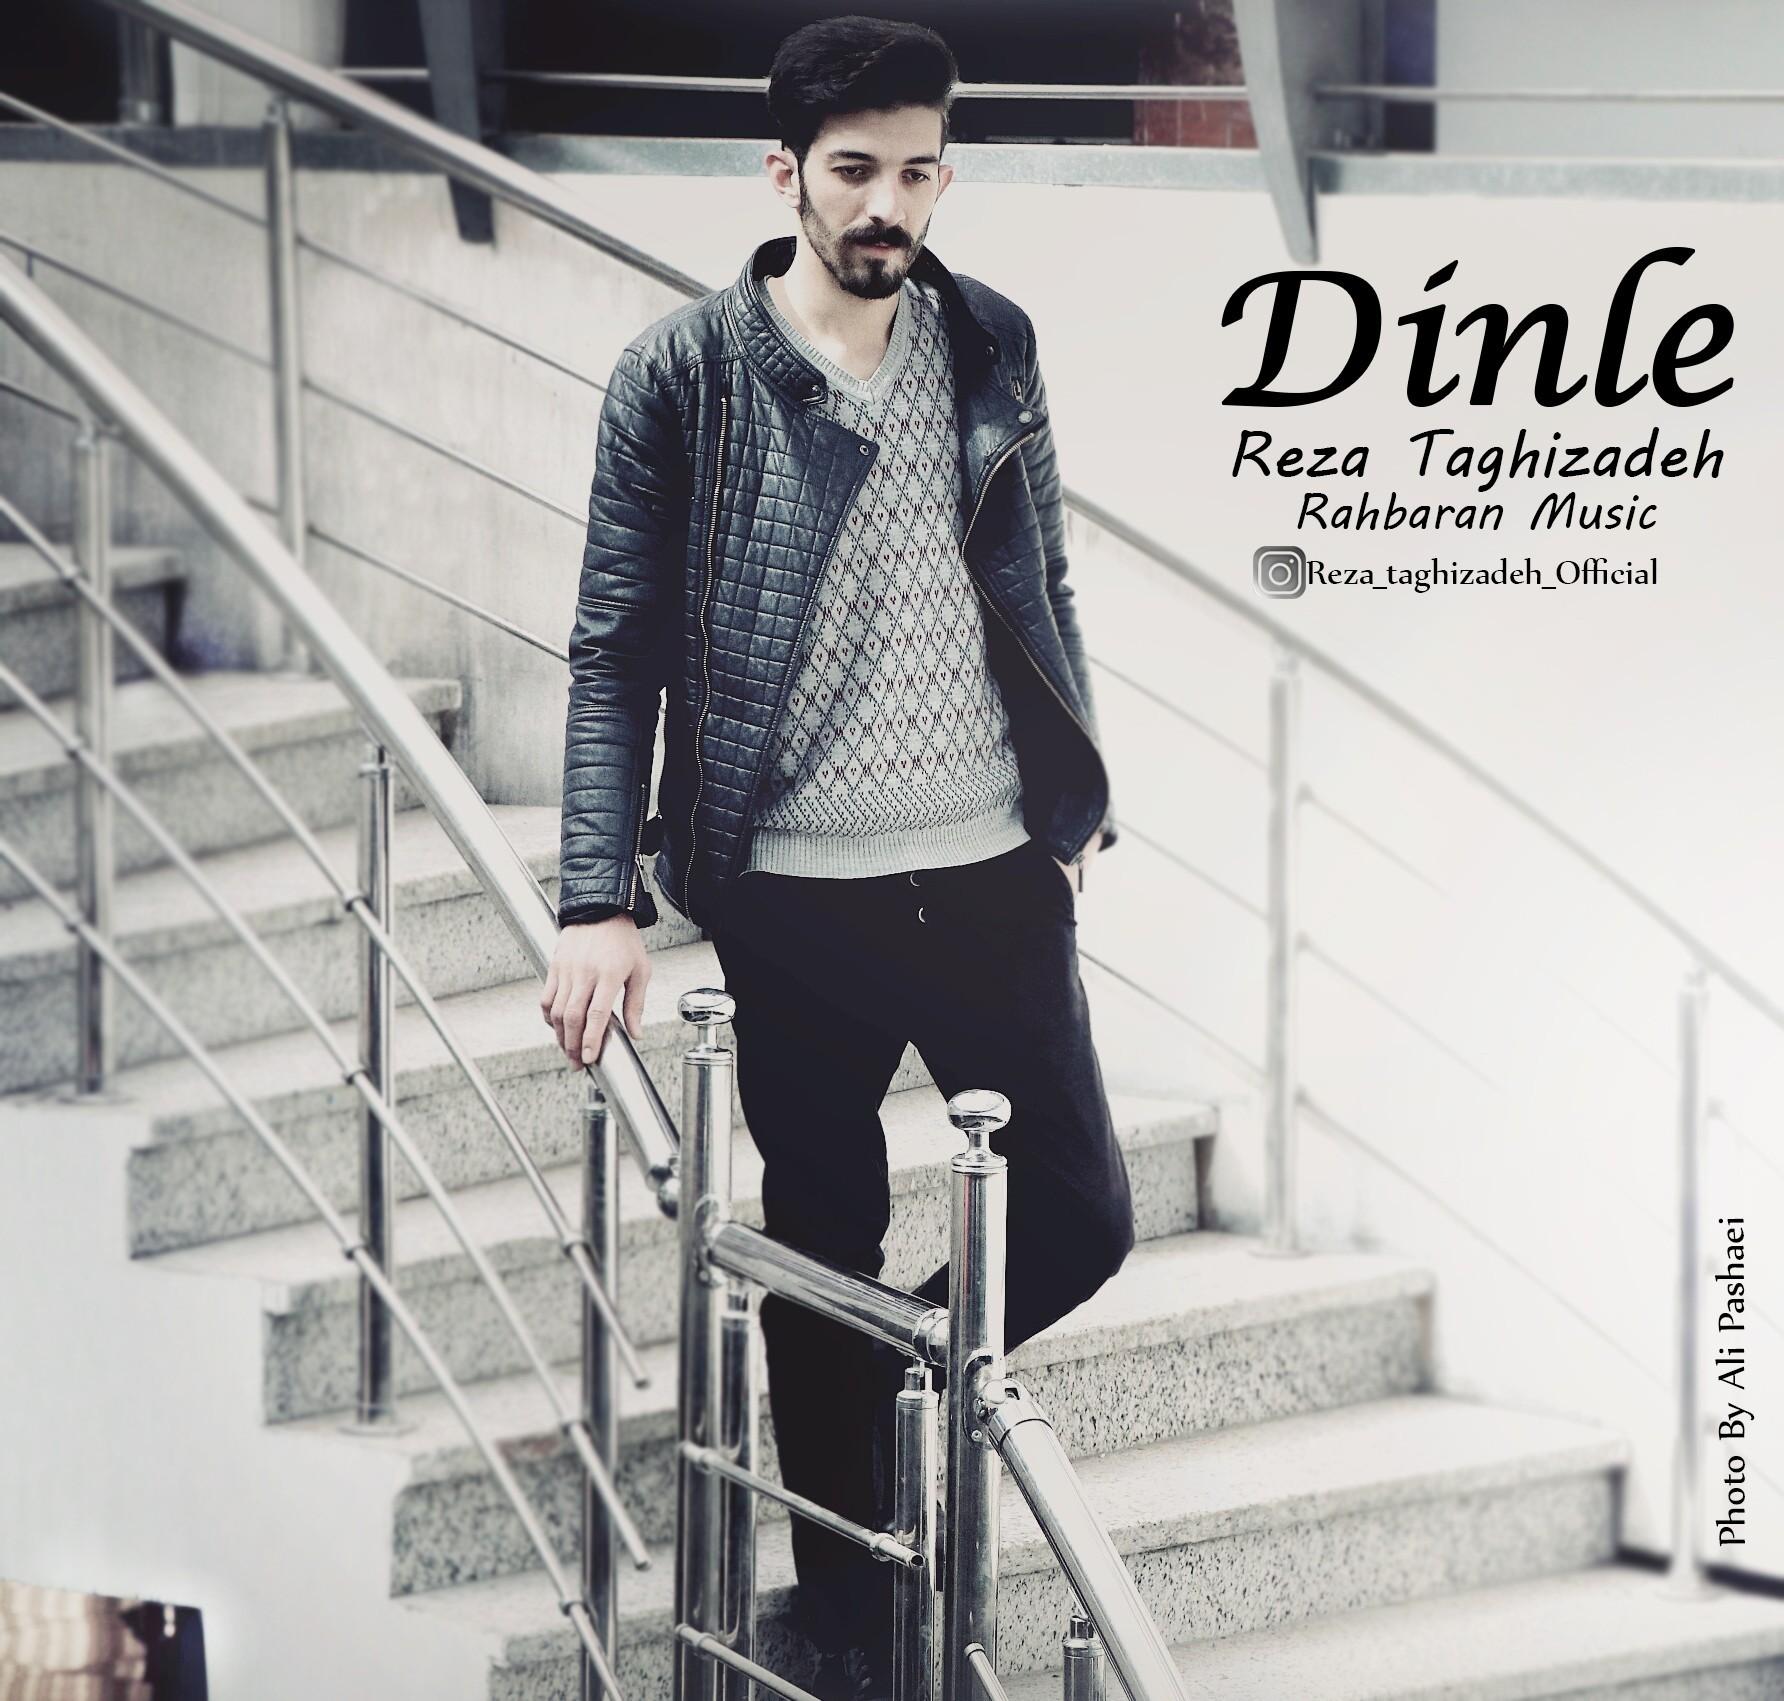 http://s9.picofile.com/file/8326534168/26Reza_Taghizadeh_dinle.jpg